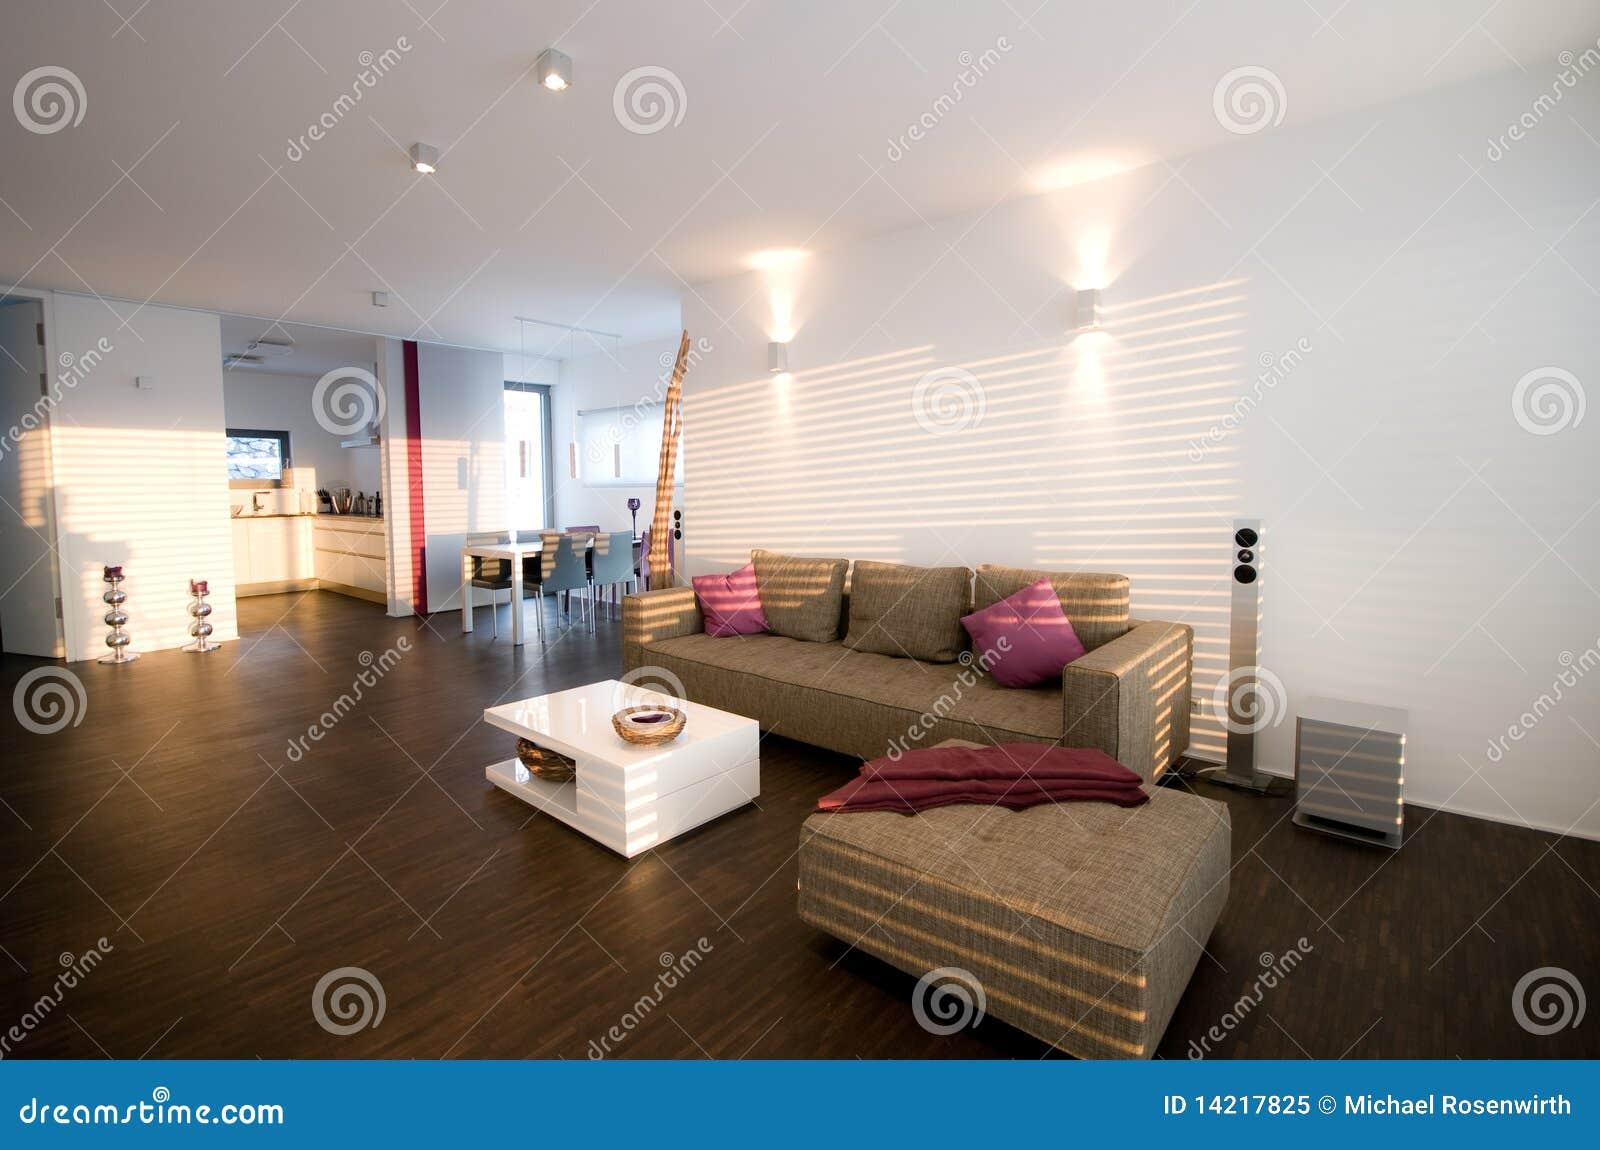 interior design royalty free stock photo image 14217825